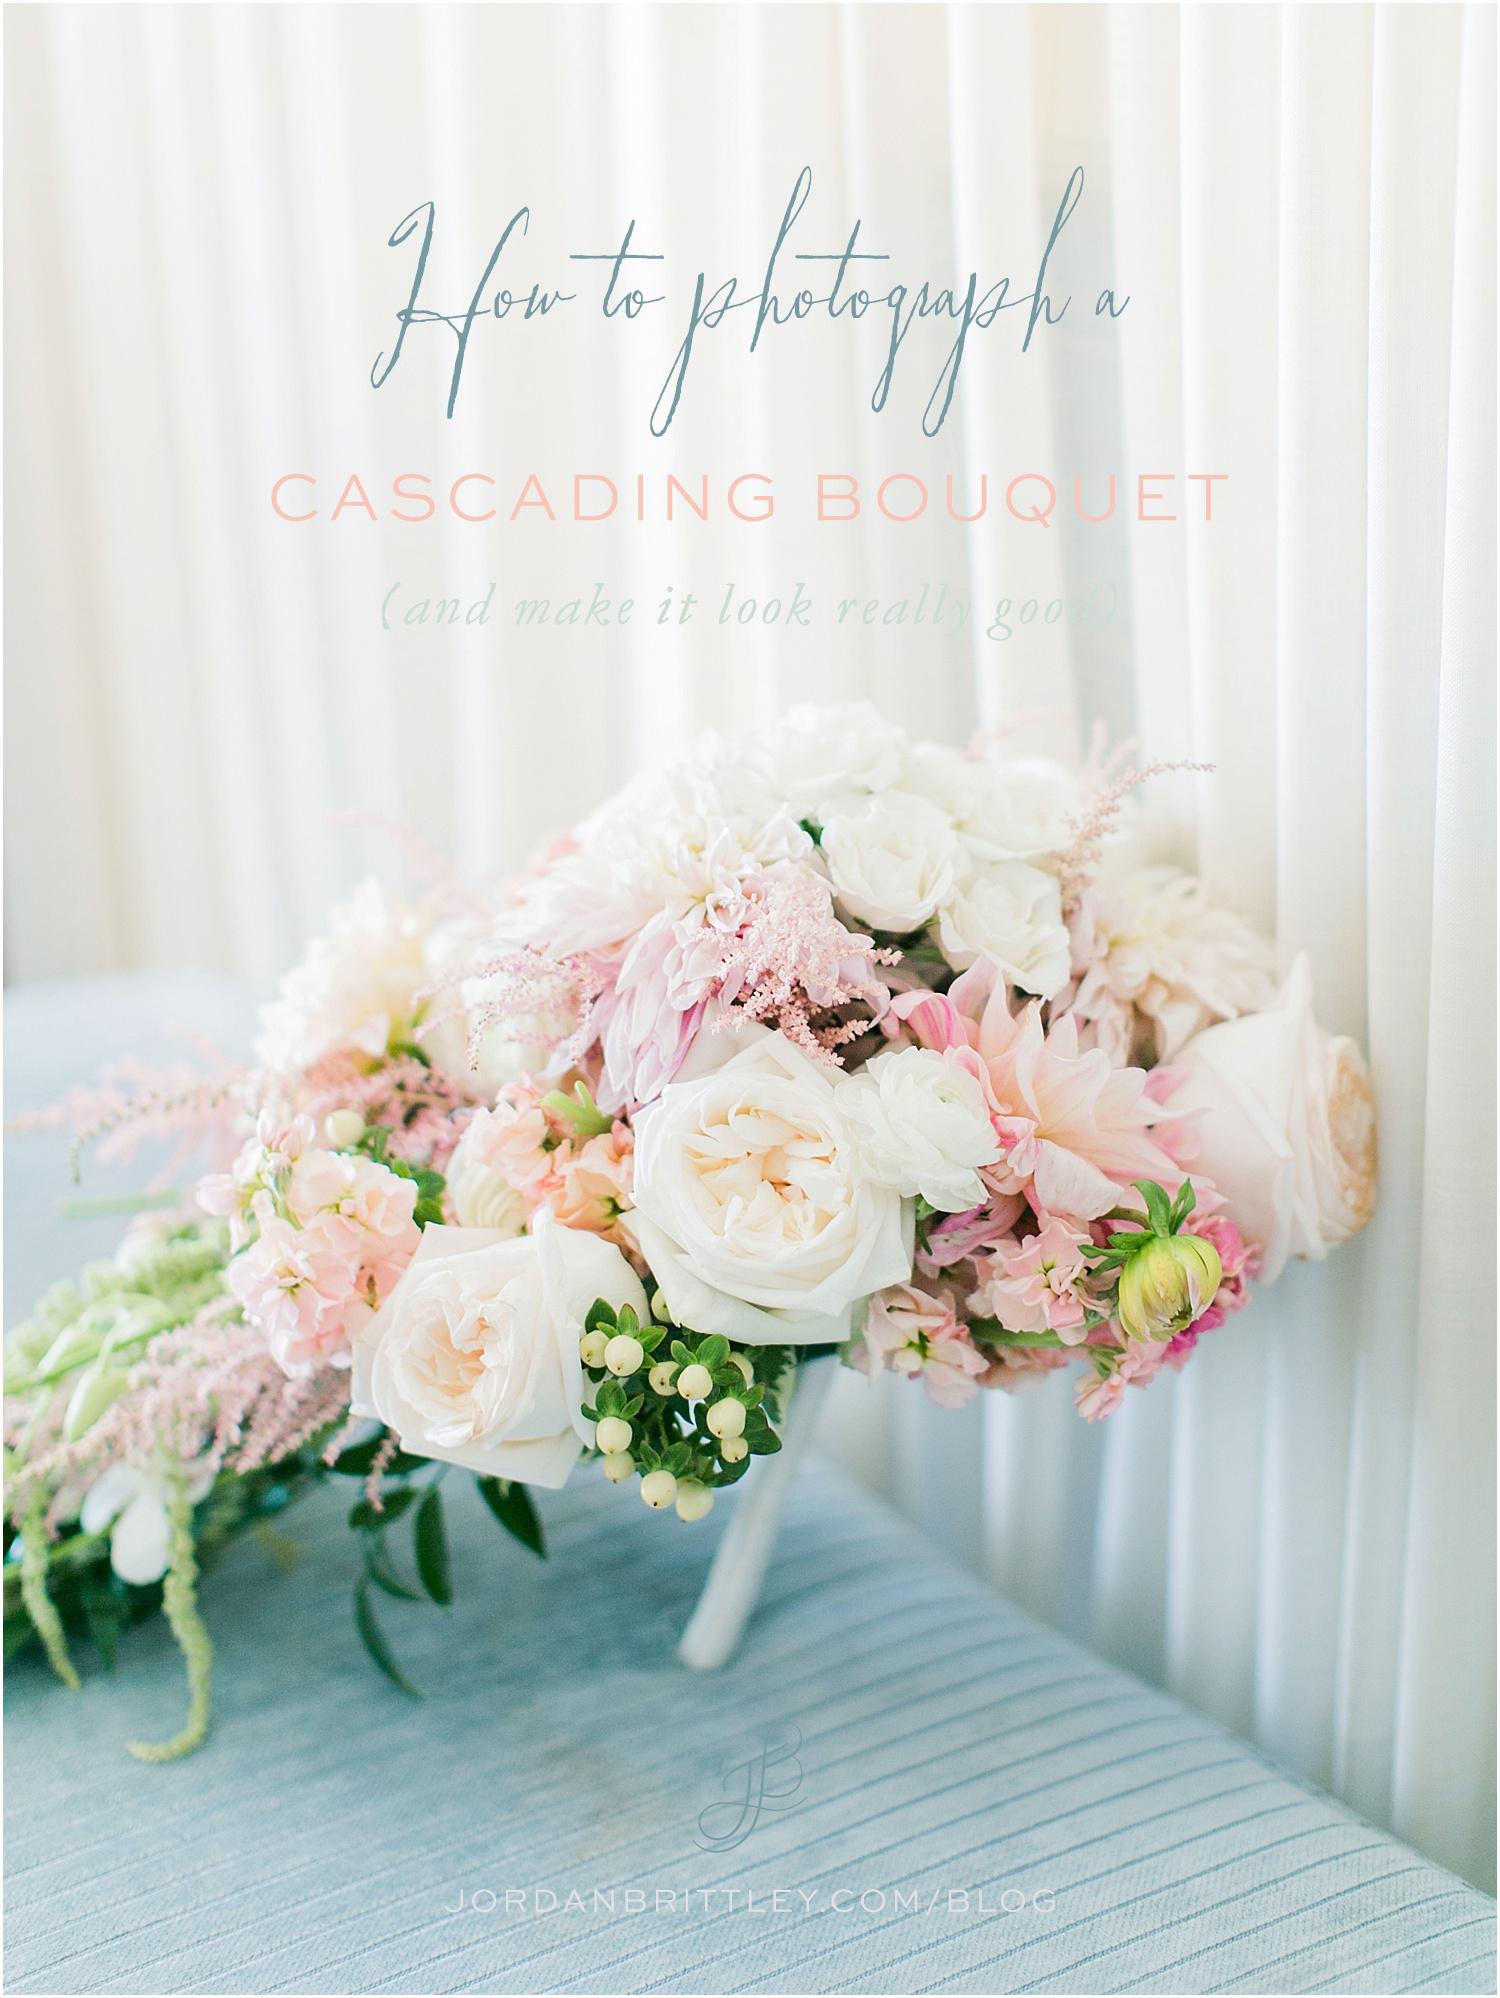 Jordan Brittley - Fine Art St Louis Wedding Photographer | Floral Design by Always in Bloom | Venue - The Ritz-Carlton St Louis, MO